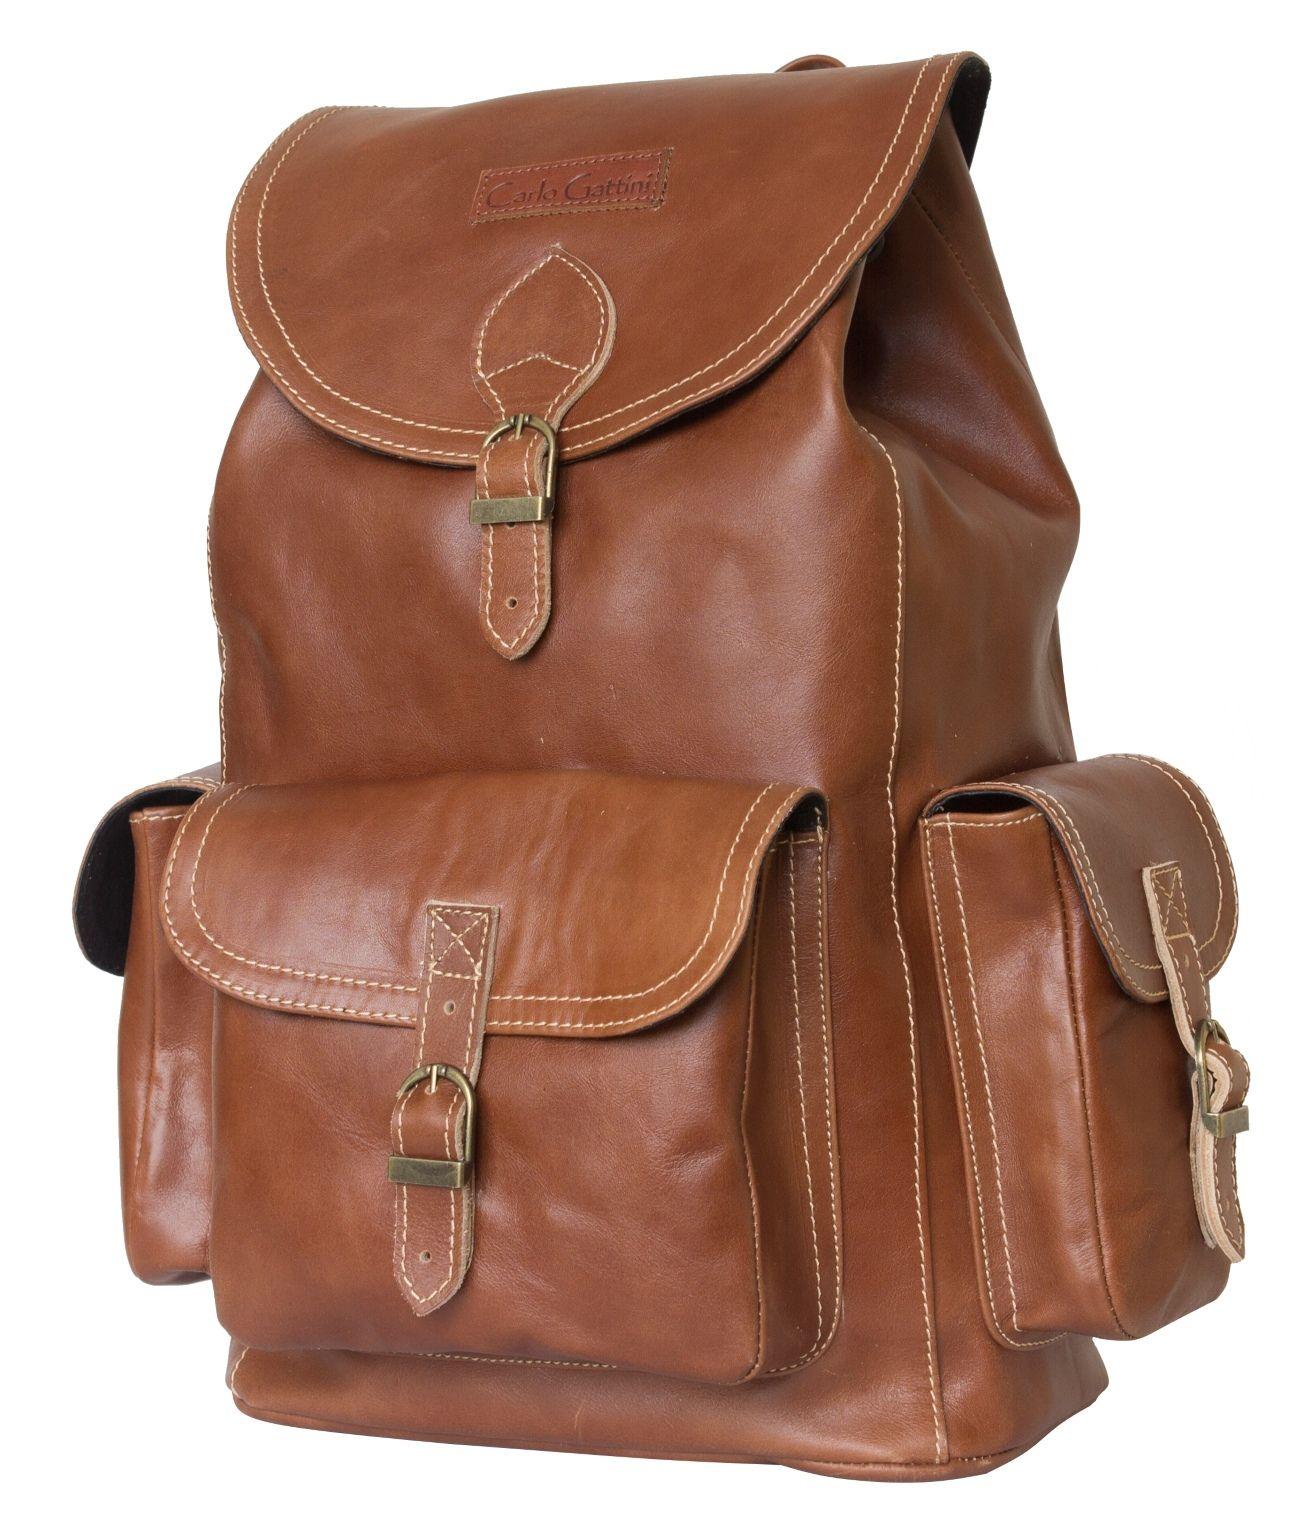 d728e95b9bff Кожаный рюкзак Carlo Gattini Verres cognac